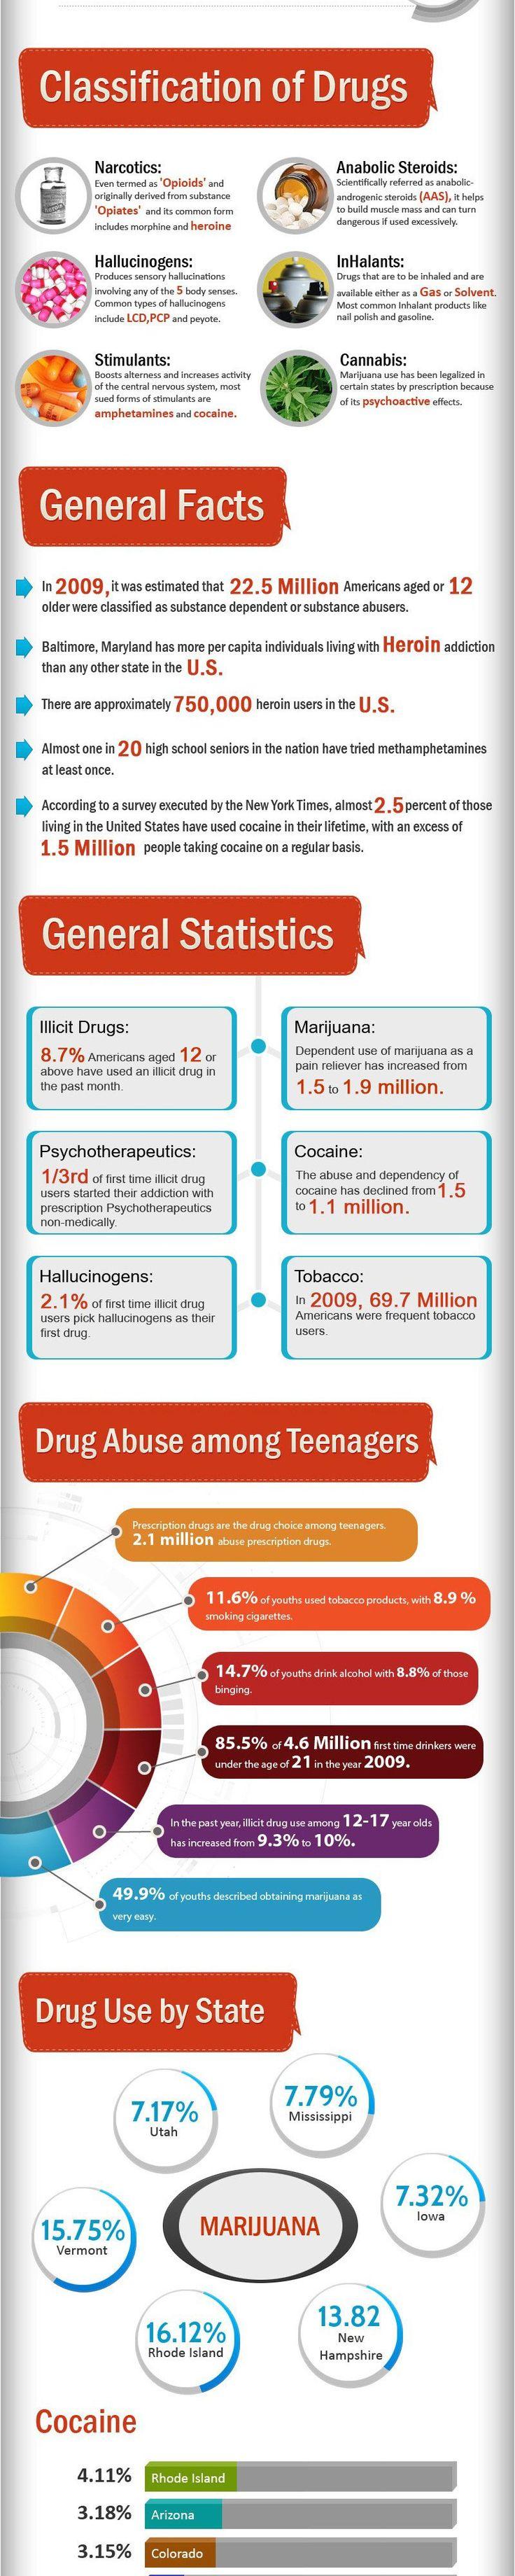 Drug Addiction And Statistics Infographic www.facebook.com/nodrugsnowar www.twitter.com/nodrugsnowar